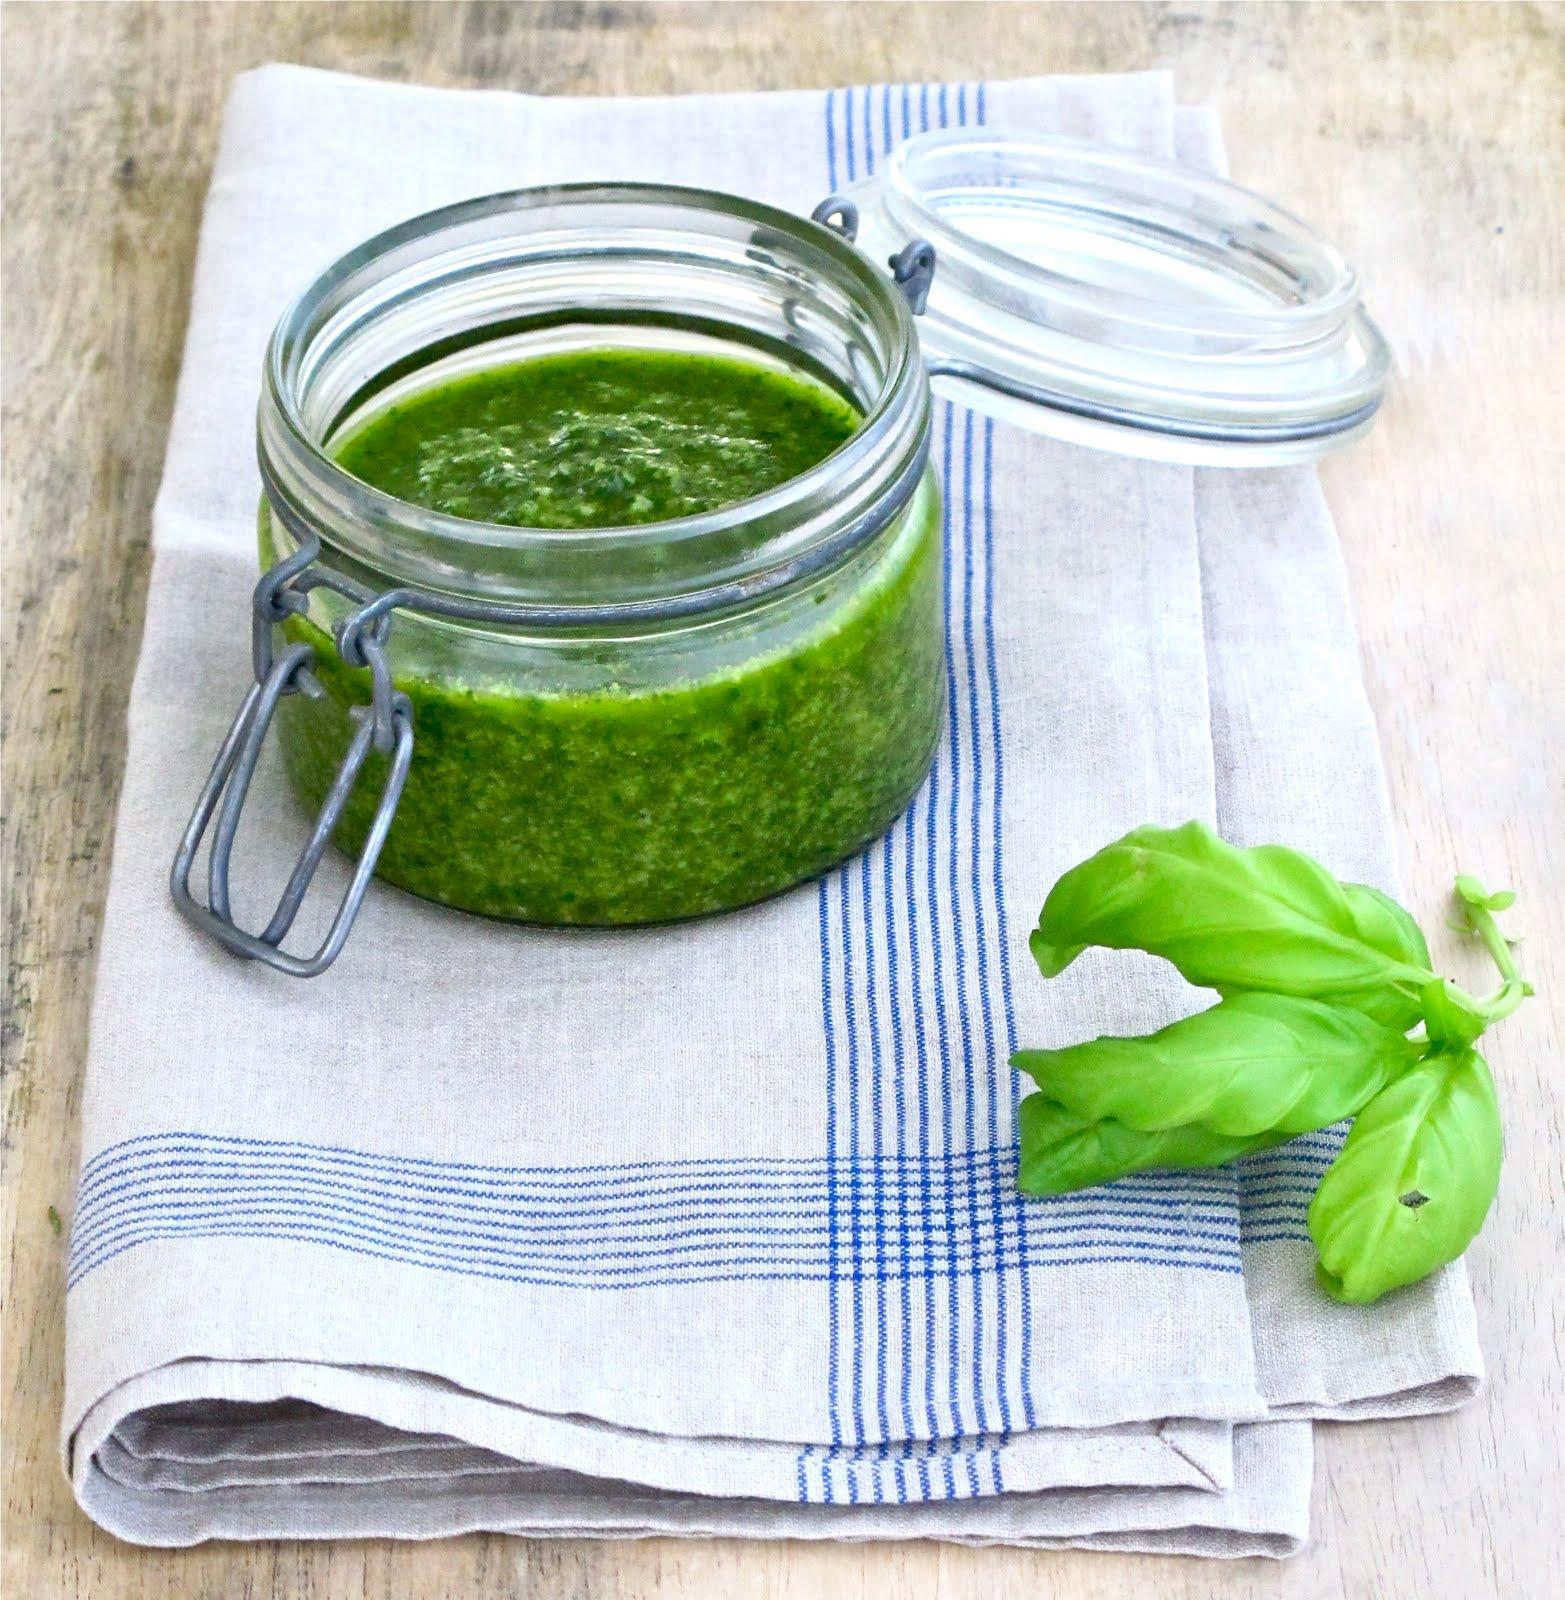 Jenny Steffens Hobick: Homemade Pesto Sauce